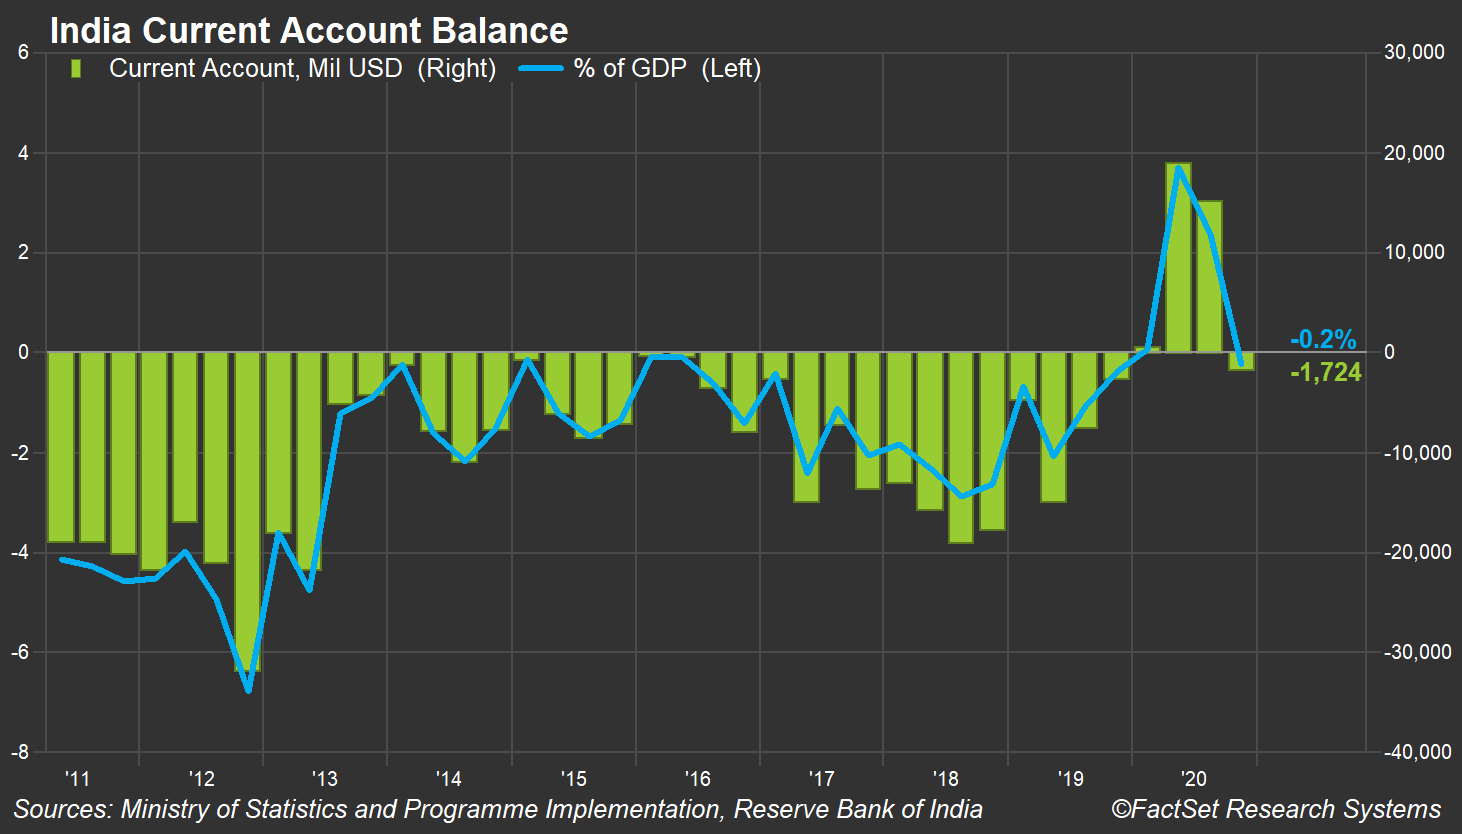 India Current Account Balance